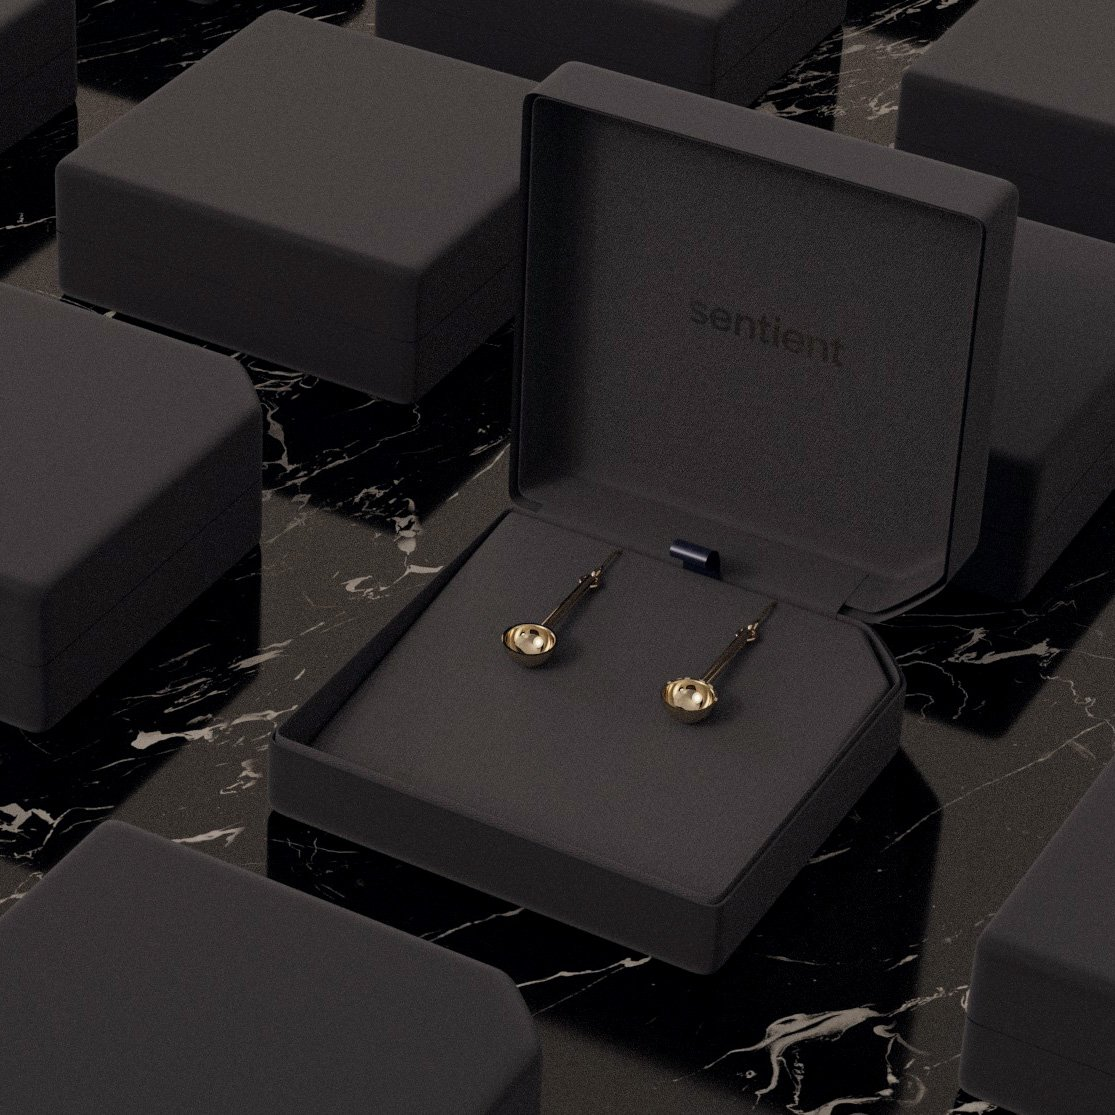 https://cdn.accentuate.io/156412674100/11305611657268/shop-all-earrings-mob-v1580159290254.jpg?1115x1115